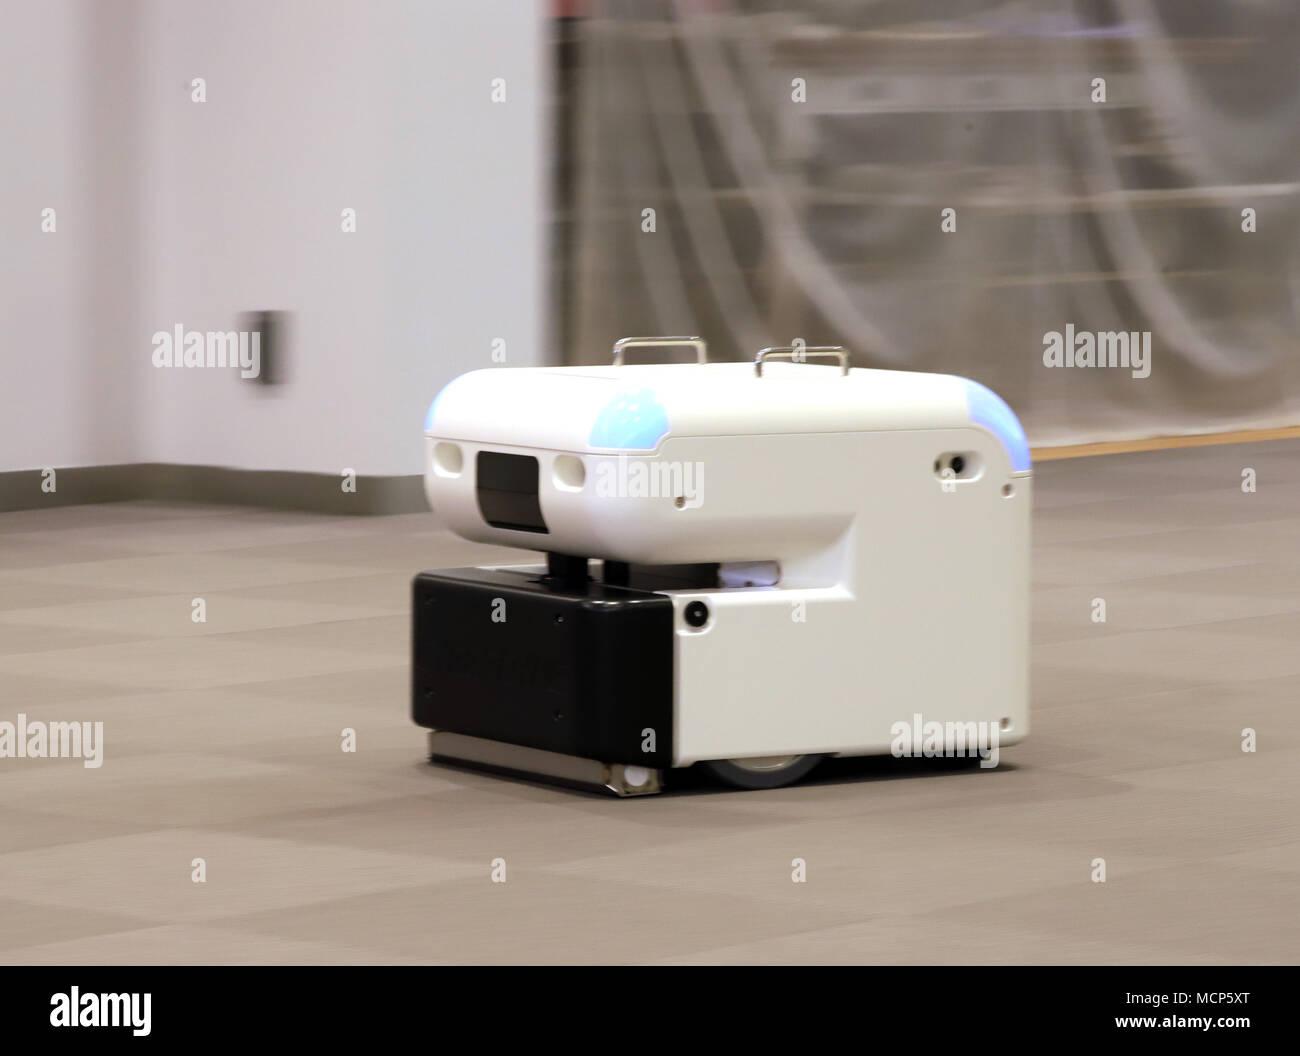 Tokyo, Japan  17th Apr, 2018  Japan's robot venture